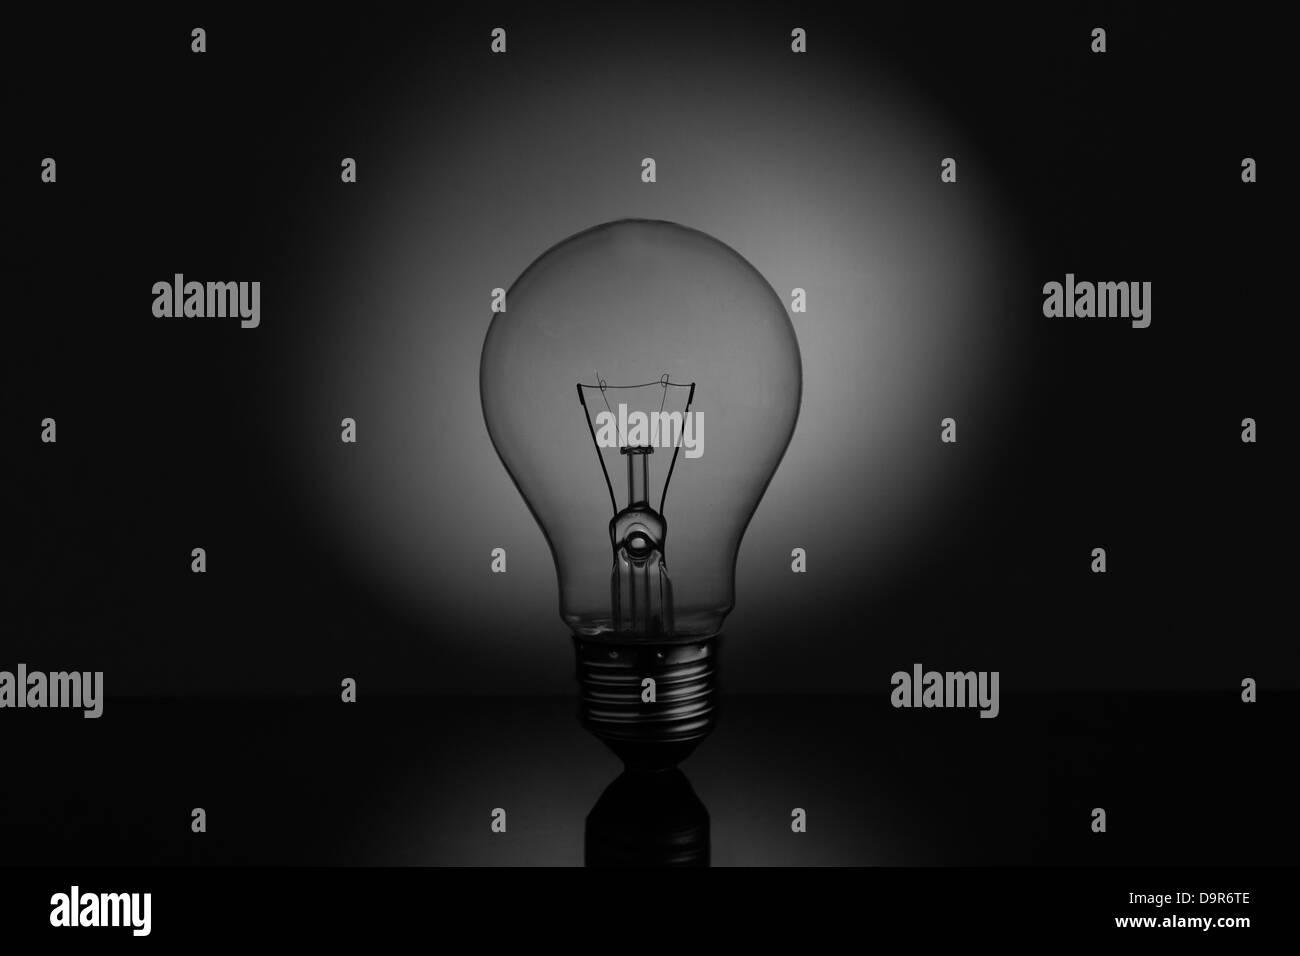 Big light bulb standing on reflective surface Stock Photo